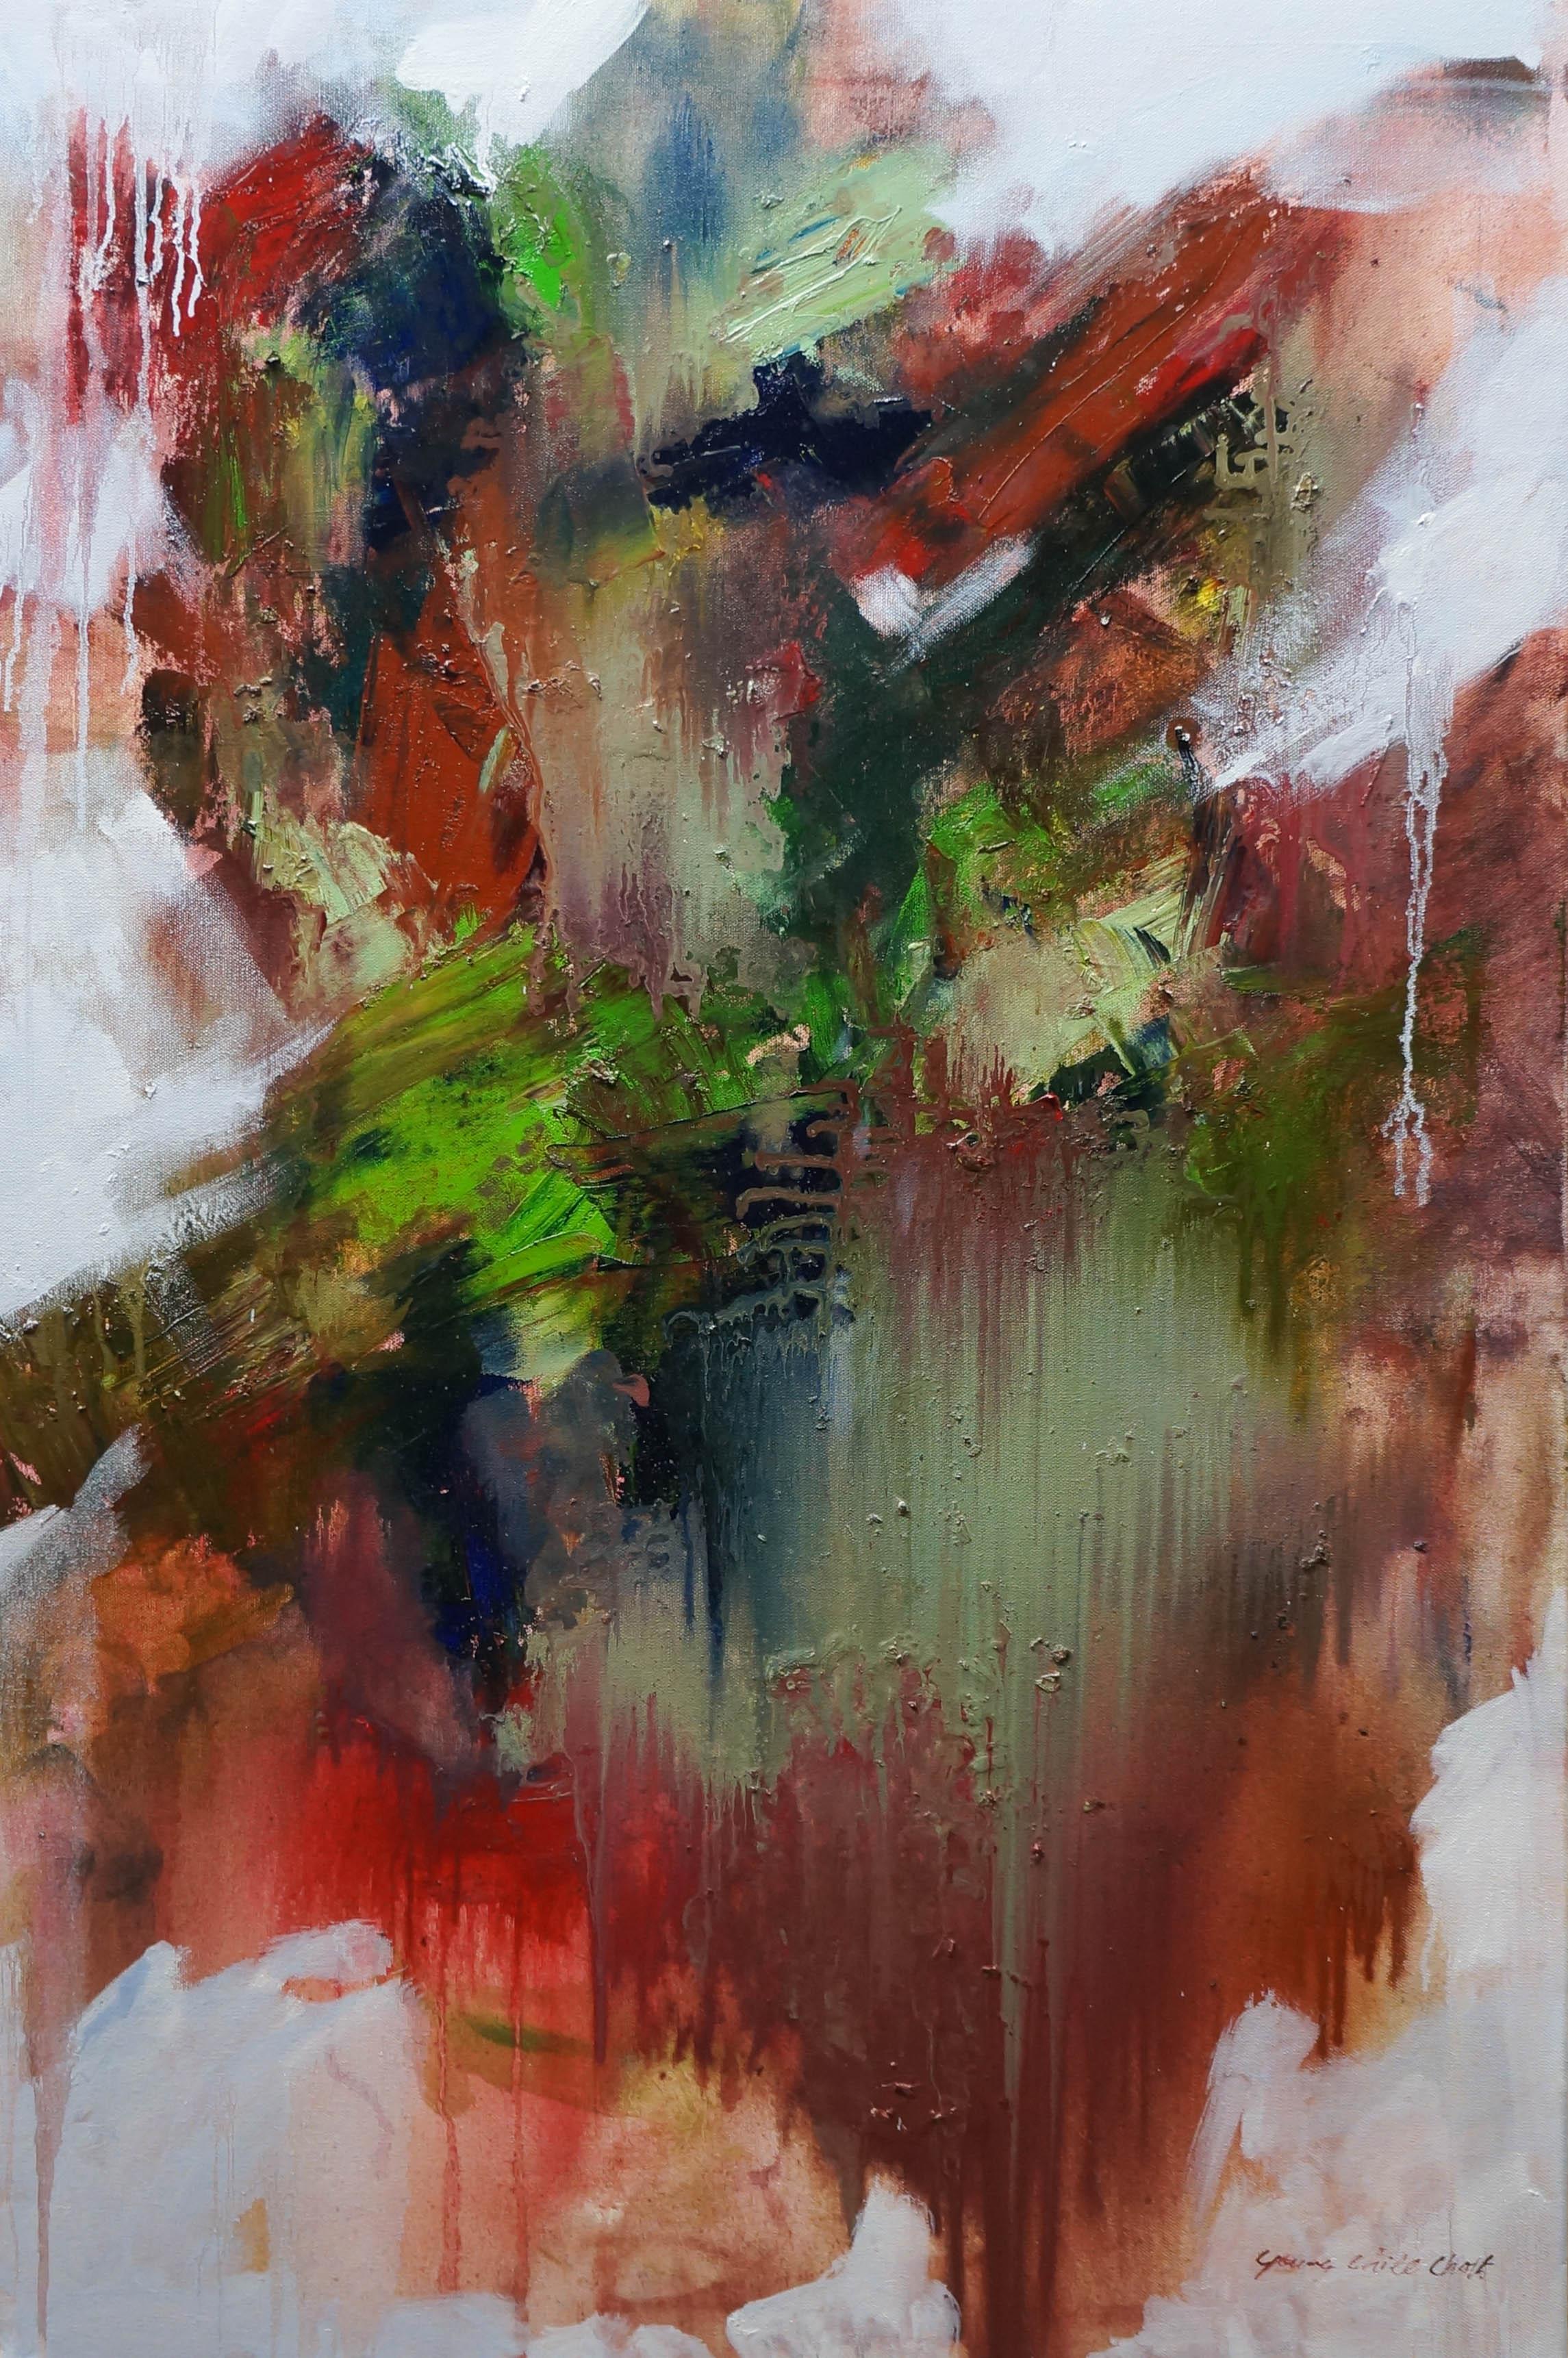 untitled.24x36in.acrylic on canvas.jpg